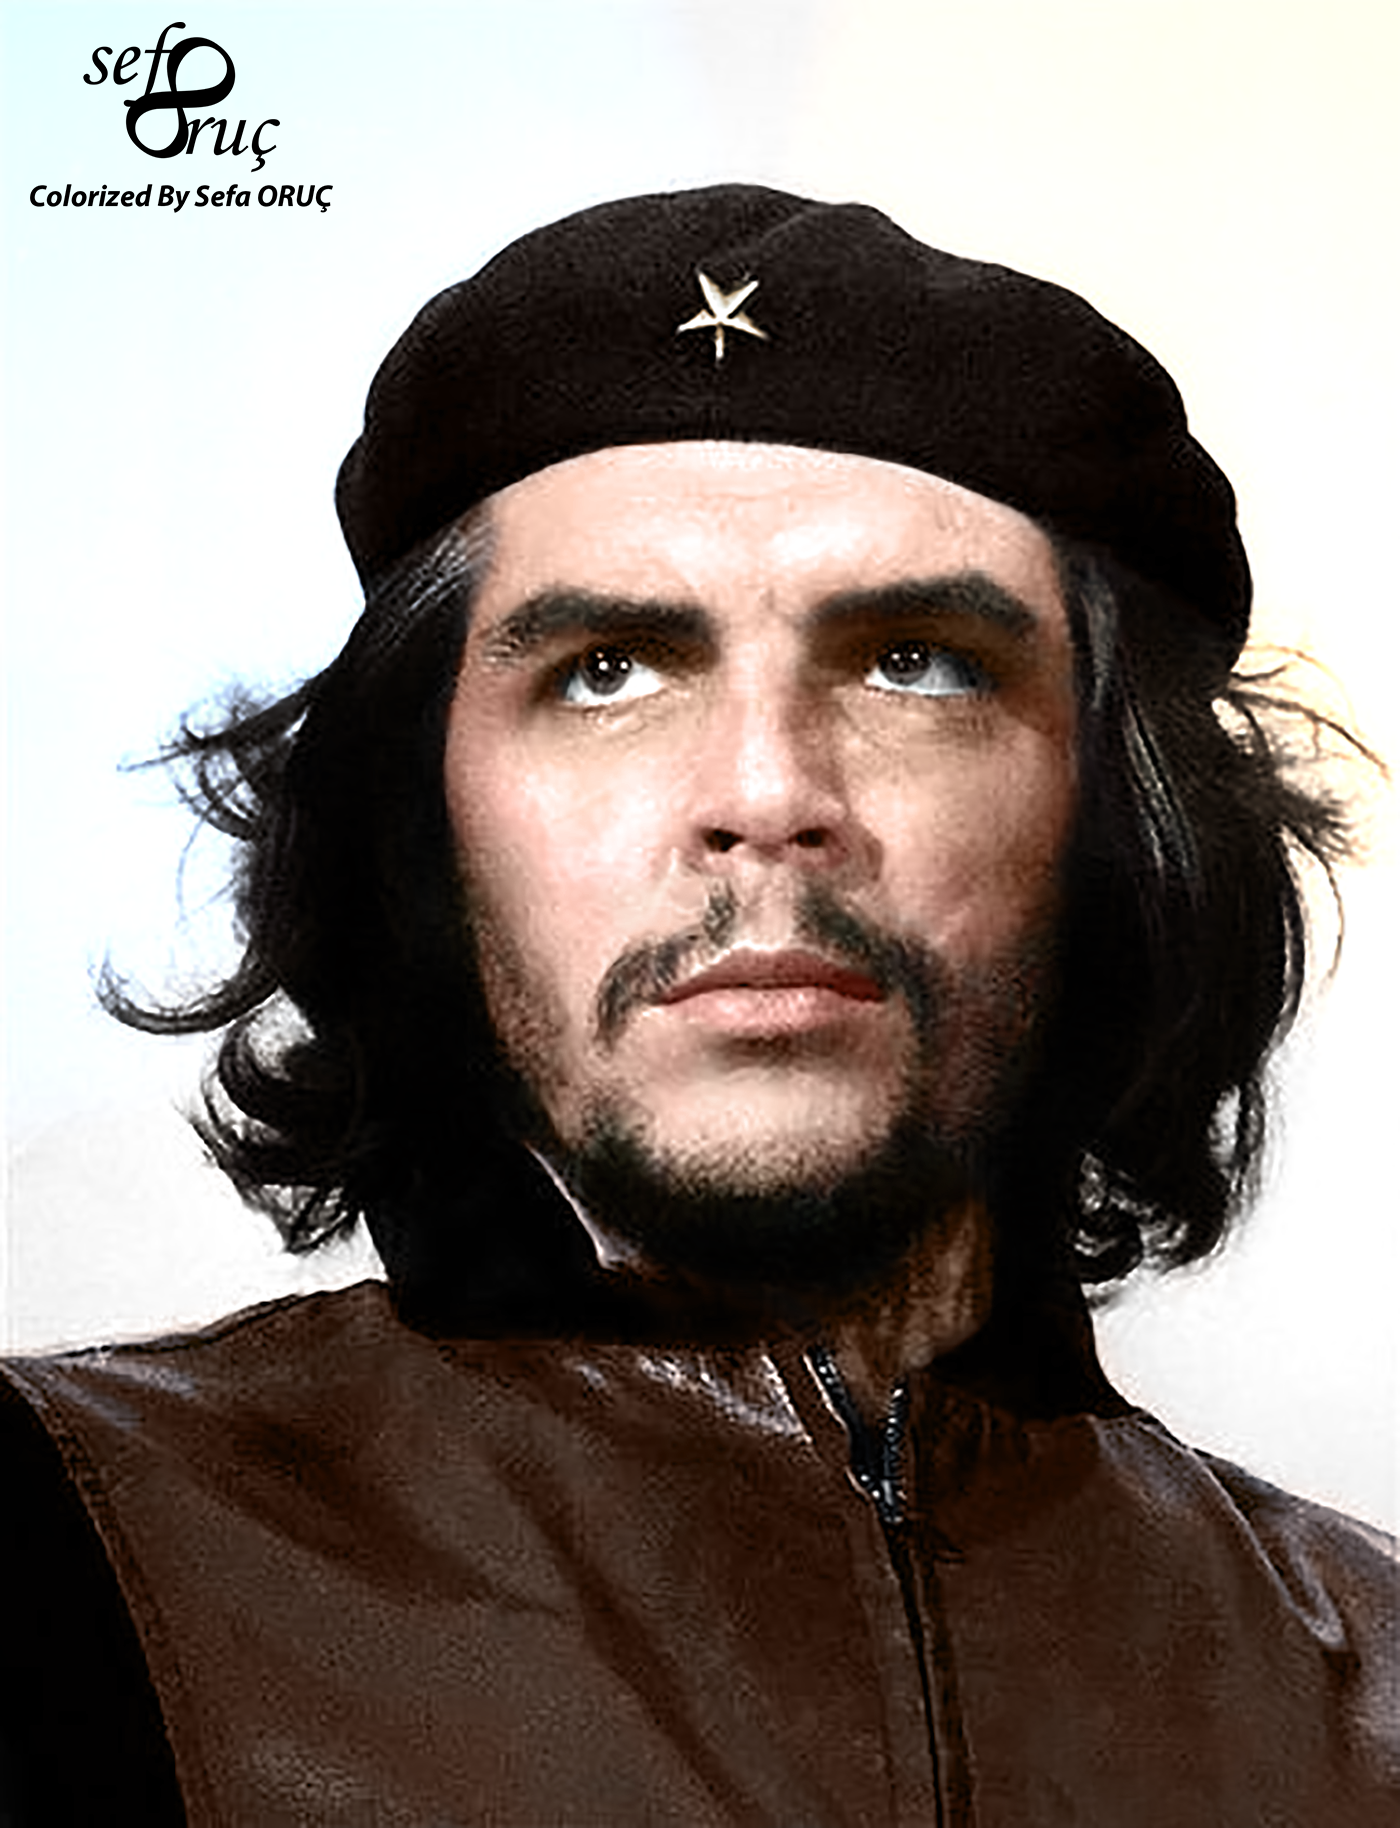 Pin On Renklendirdigim Che Guevara Fotograflari